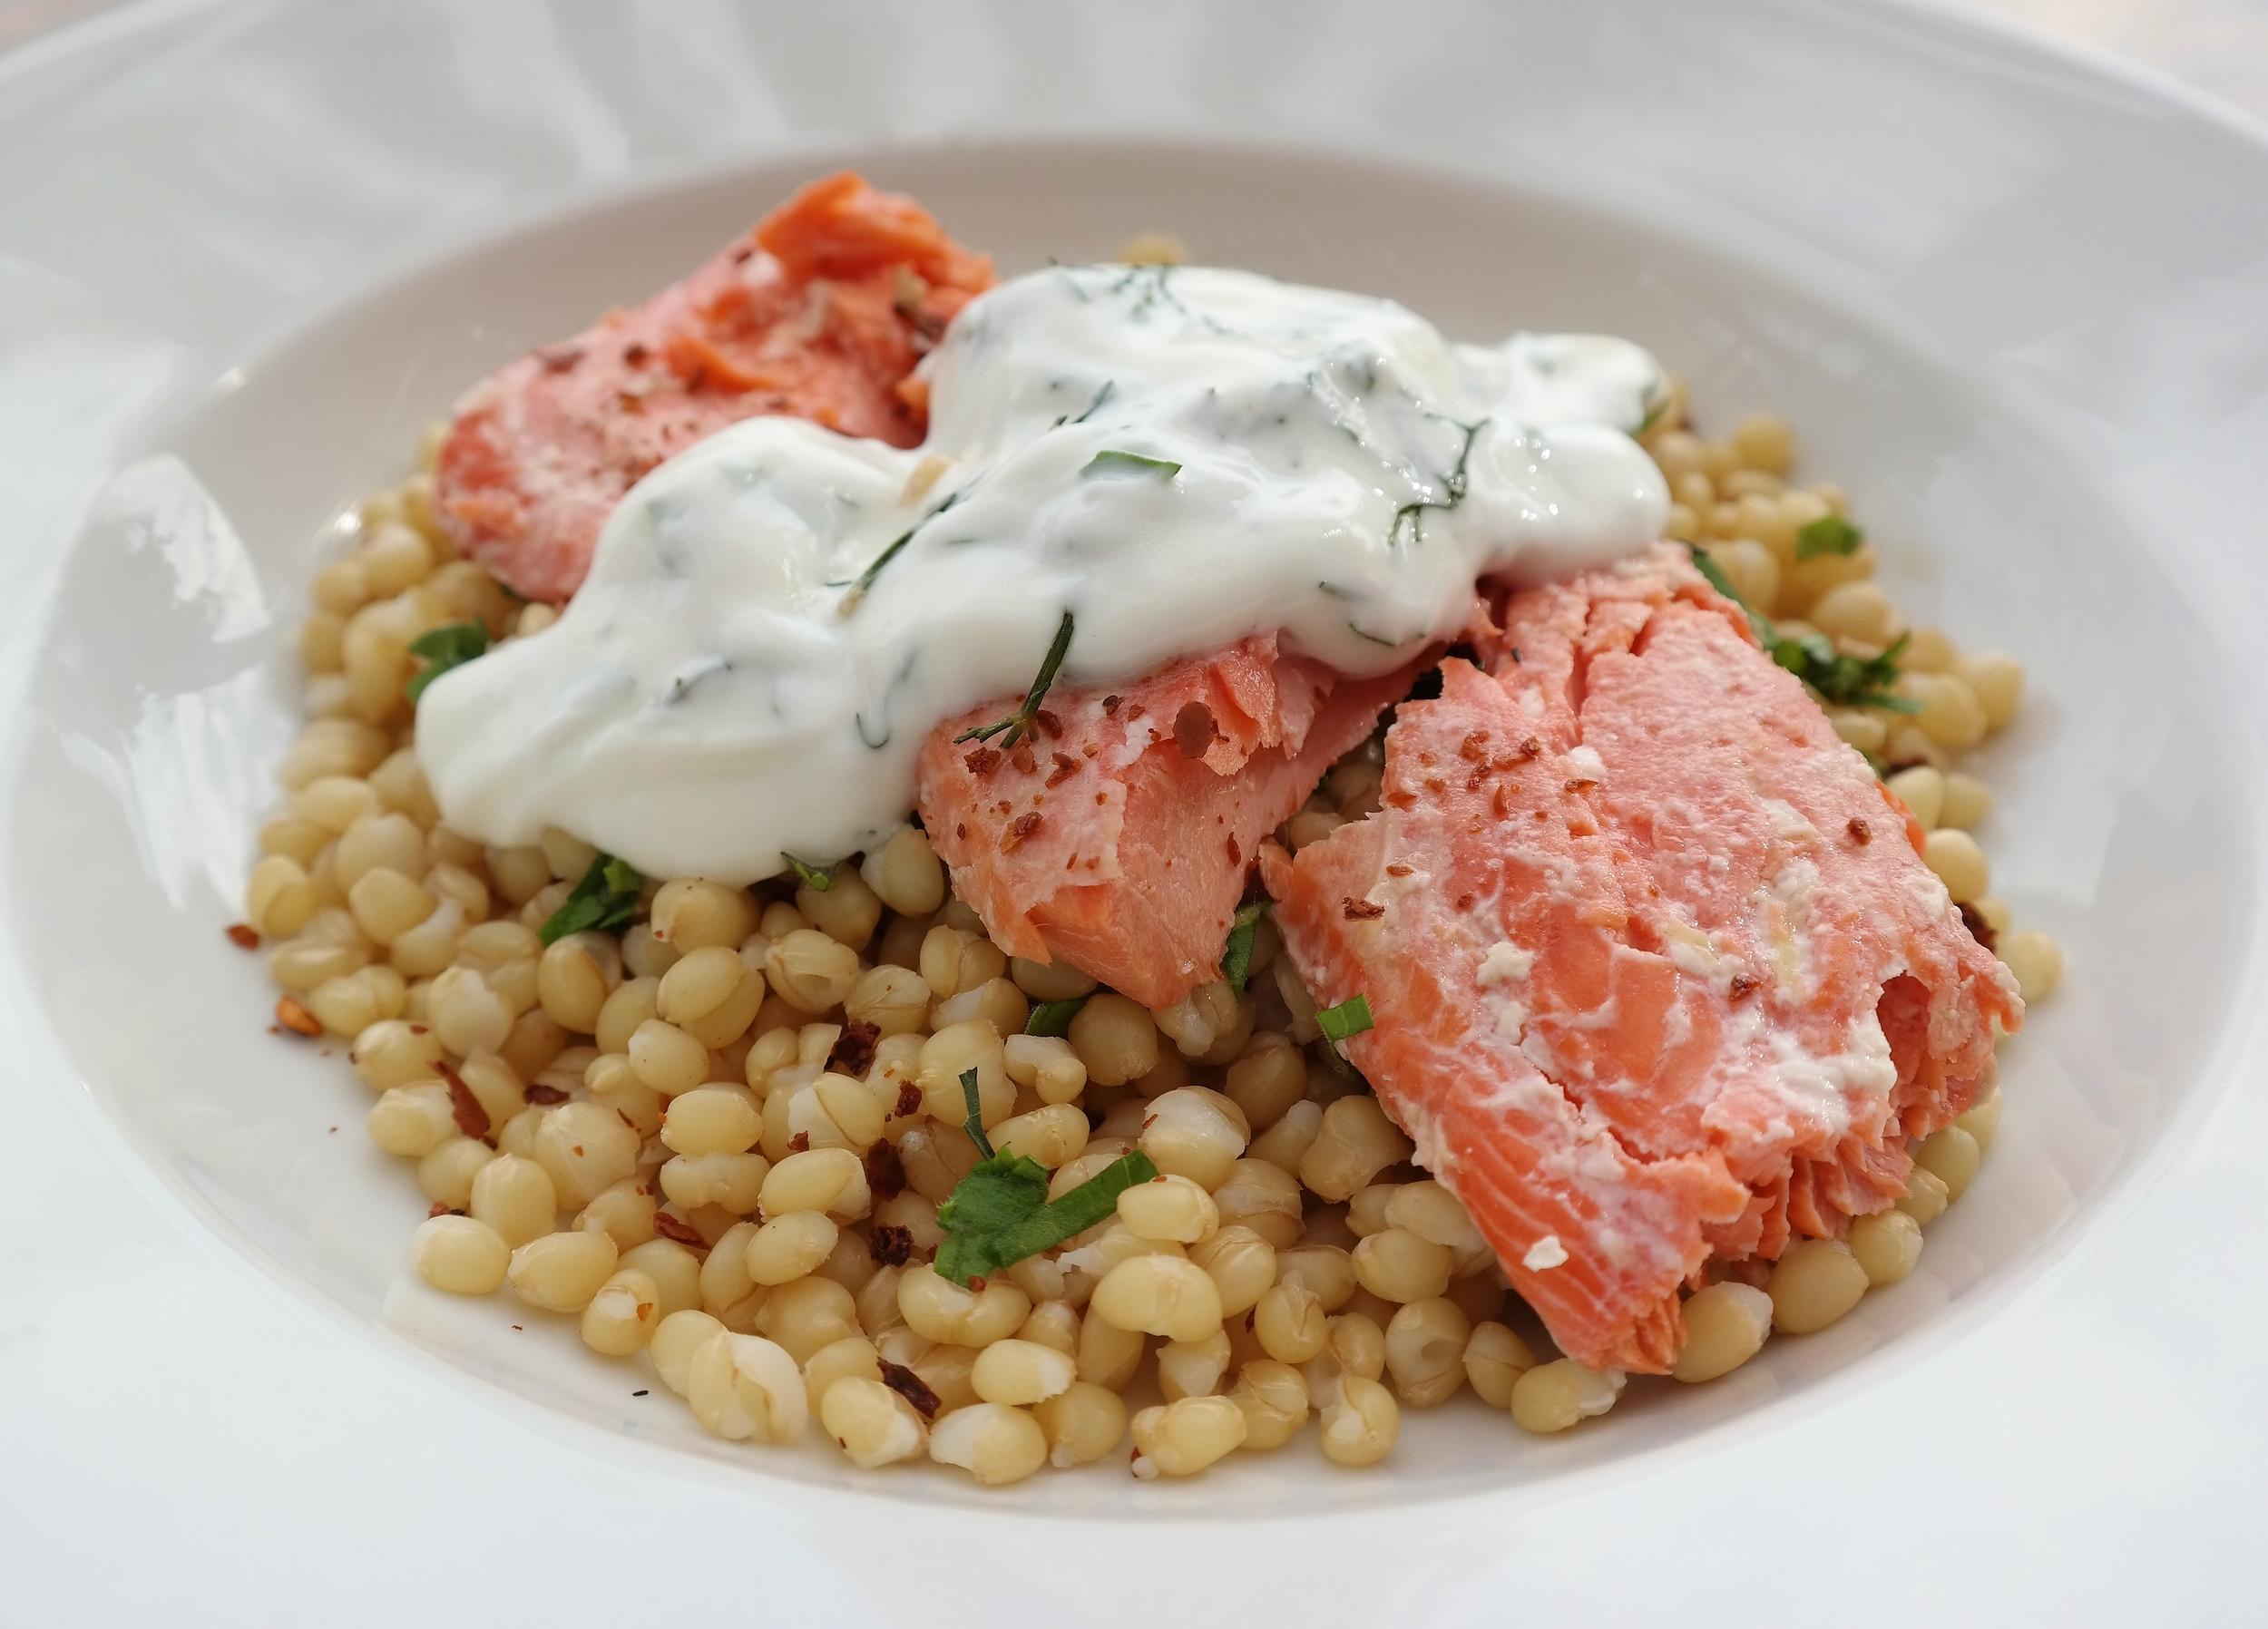 Sockeye salmon with Israeli couscous and dill yogurt sauce